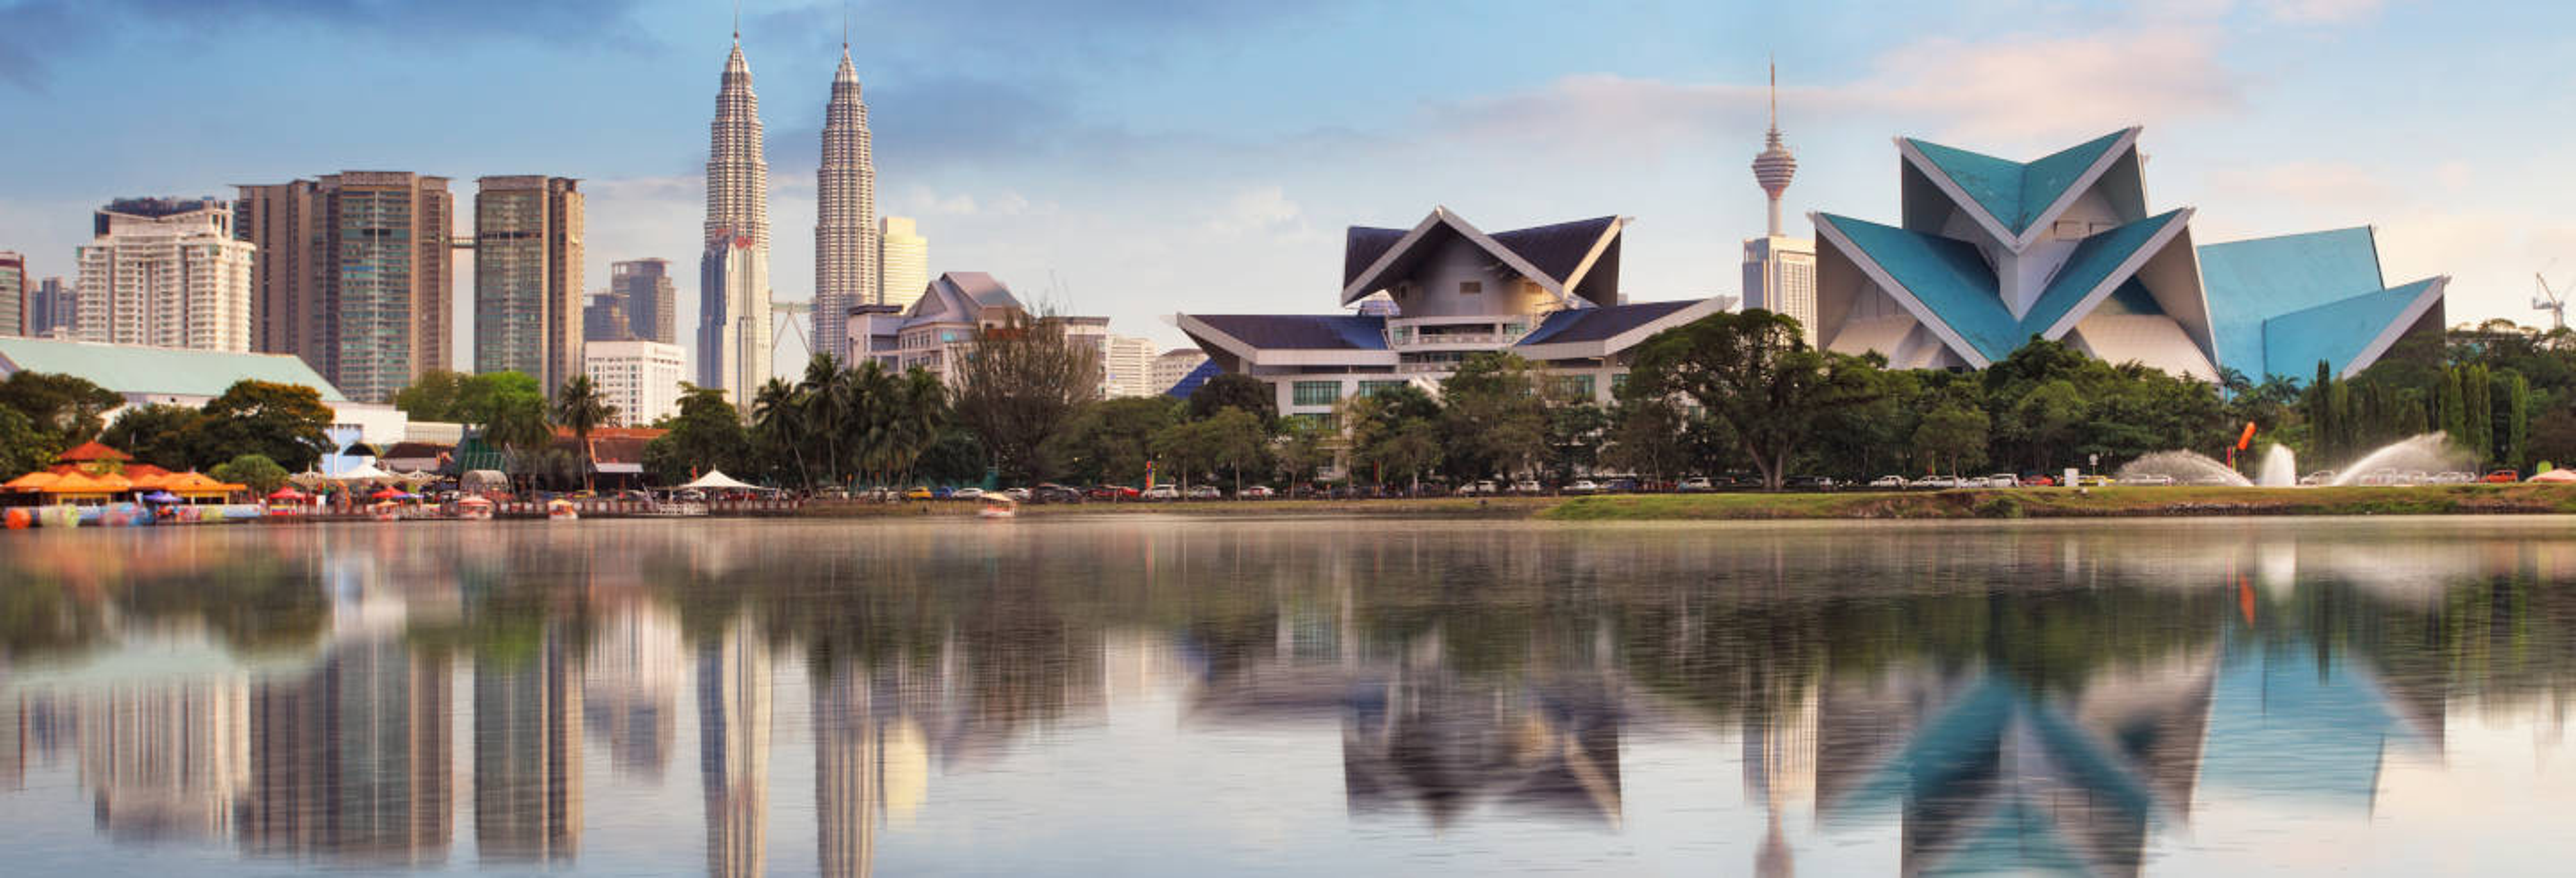 Tour de bicicleta por Kuala Lumpur